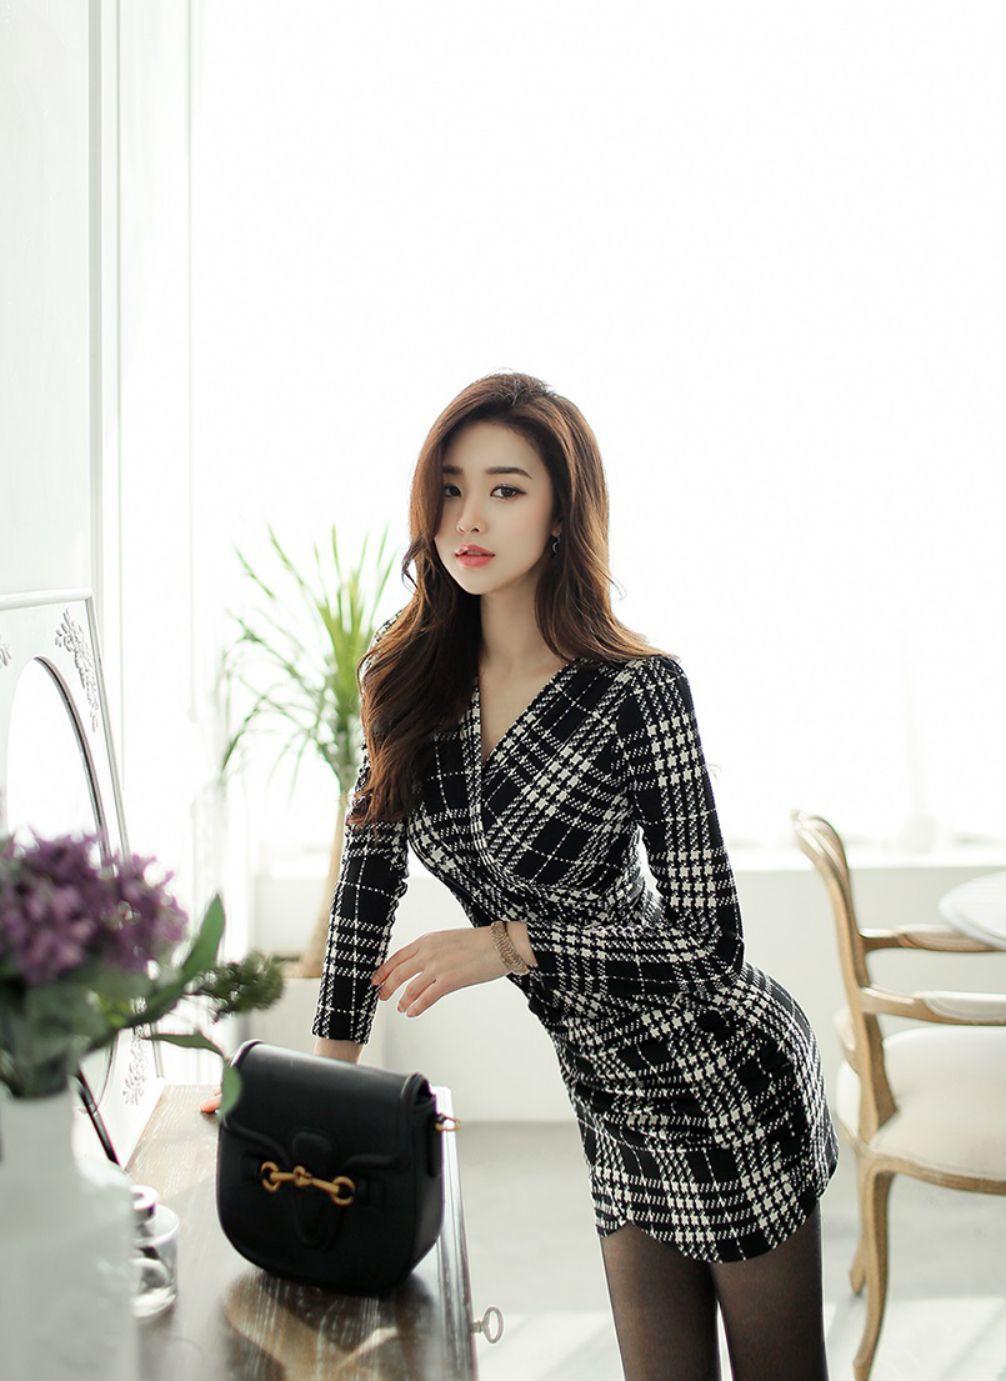 Park Si Hyun by Race-Queen on DeviantArt